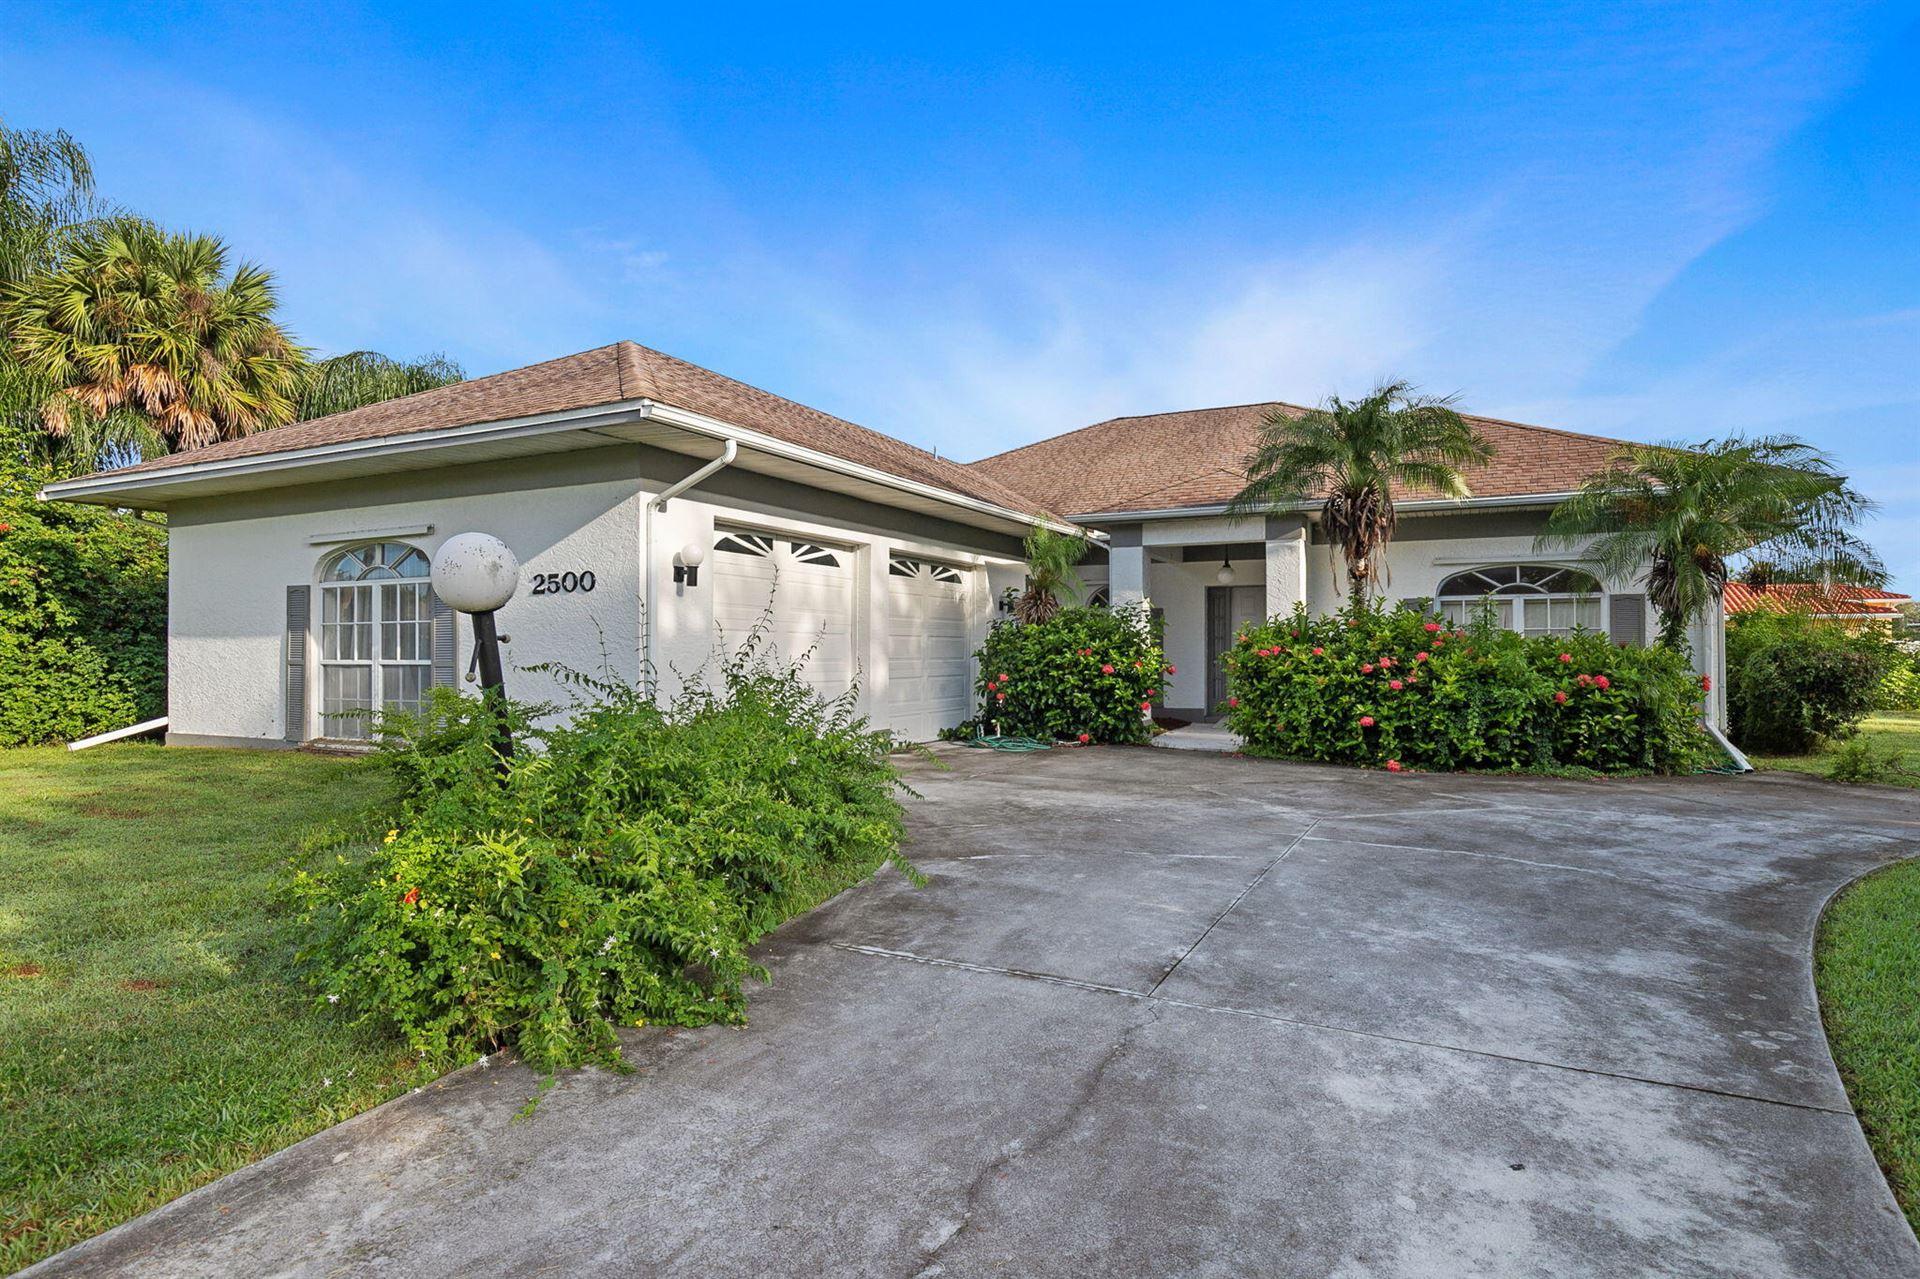 2500 Palm Lakes Drive Avenue, Fort Pierce, FL 34981 - #: RX-10747863